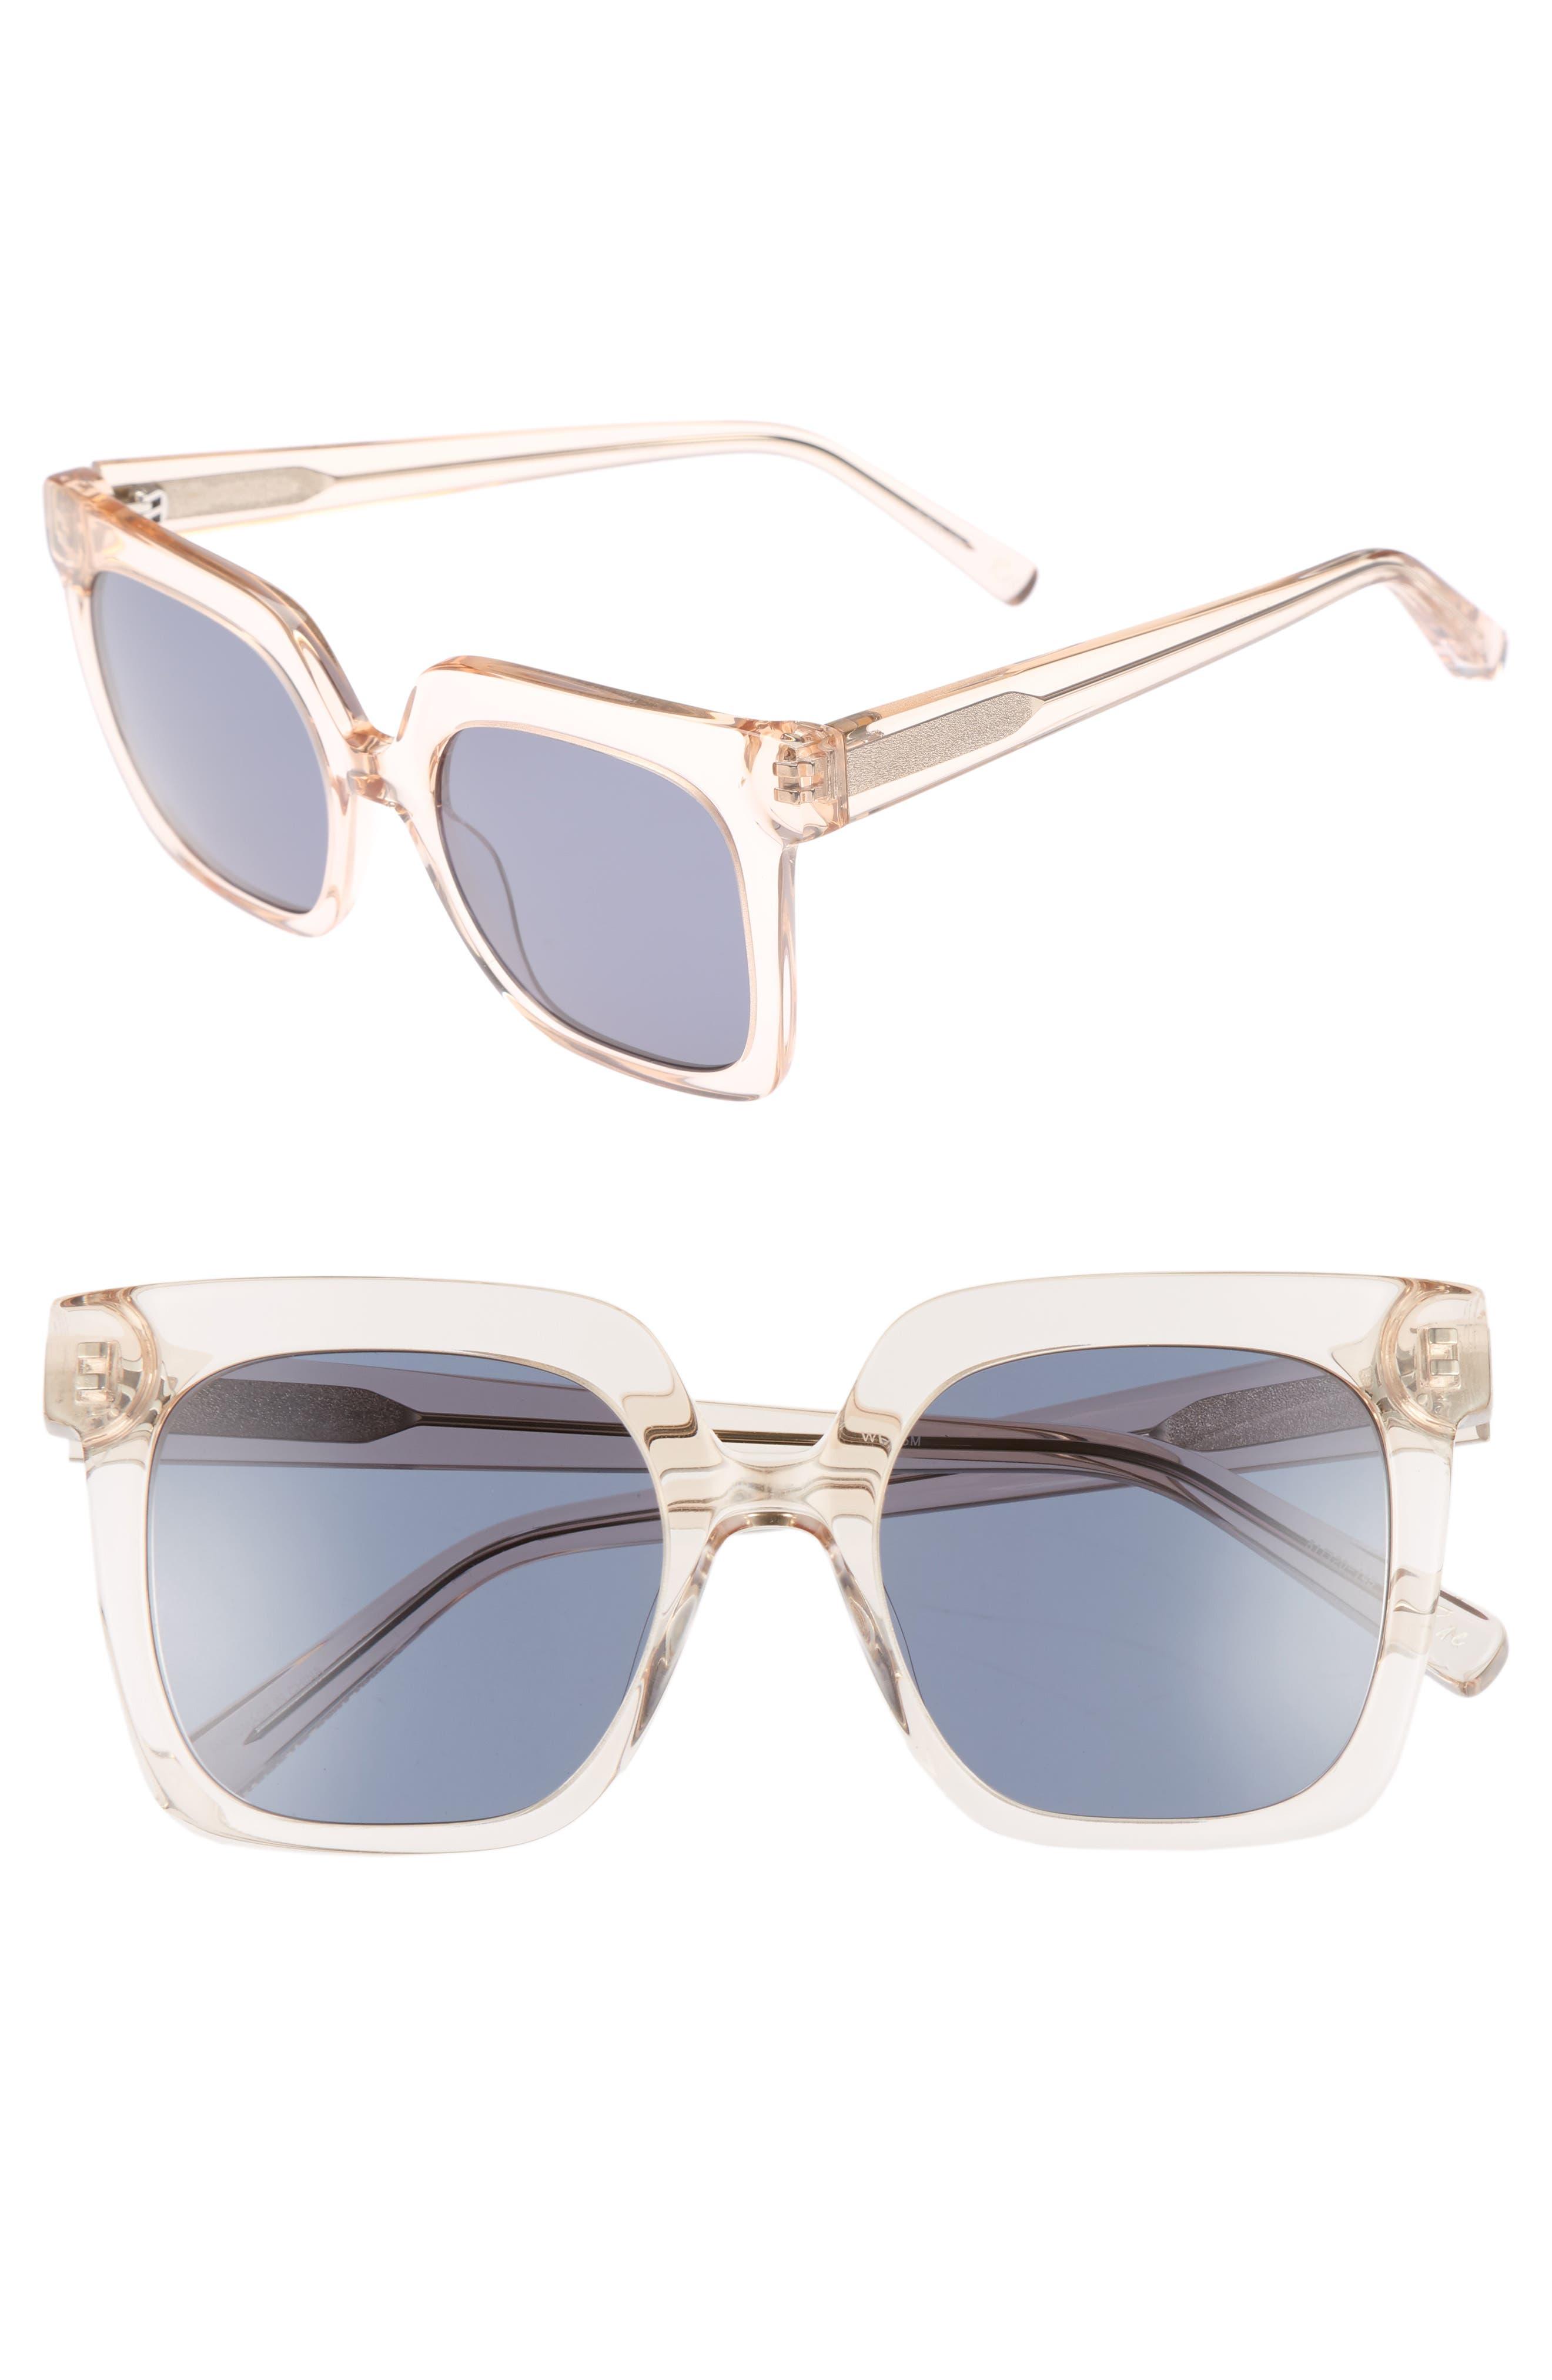 Rae 51mm Square Sunglasses,                             Main thumbnail 3, color,